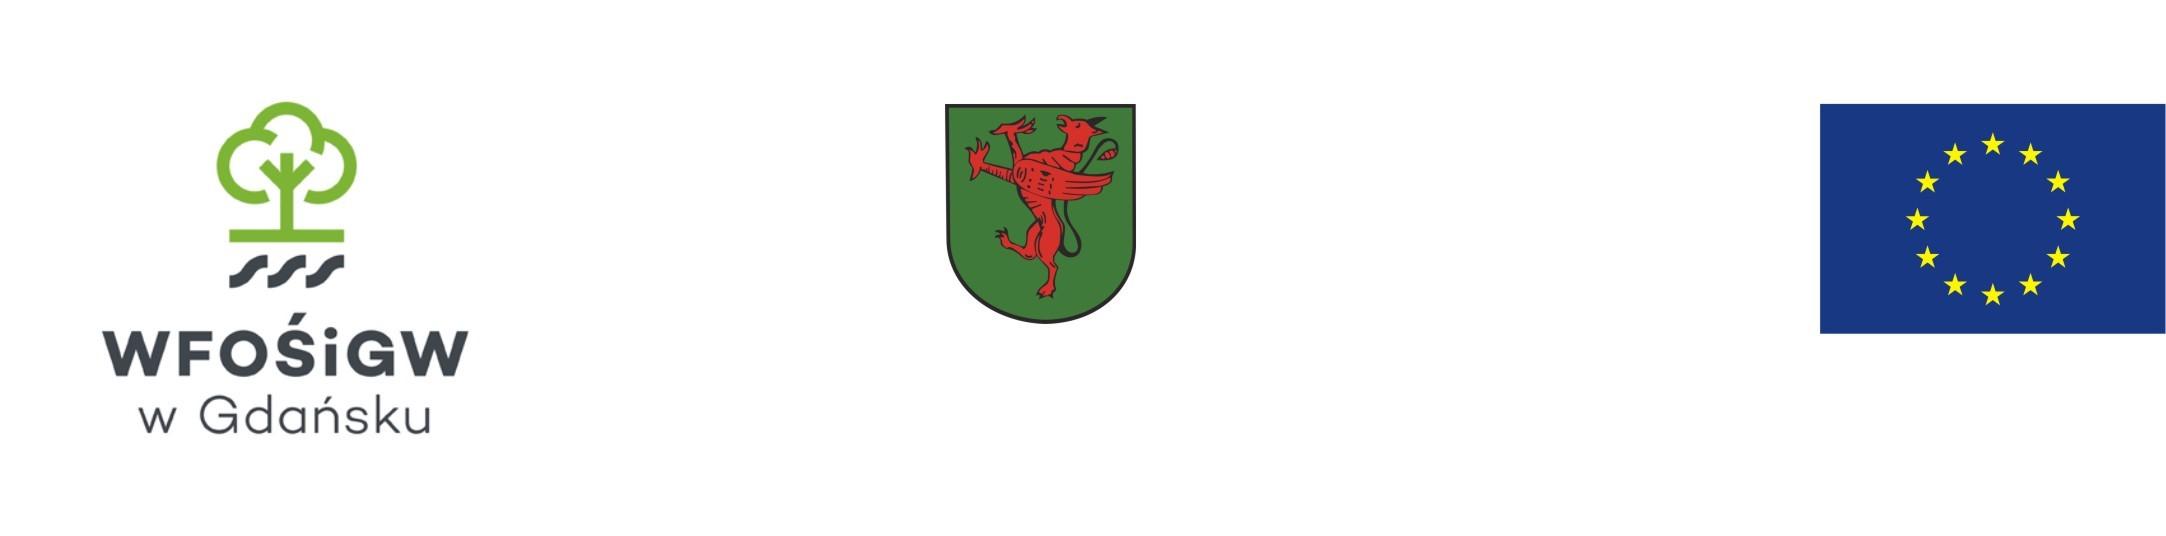 20151113123049_logo_wfosjpg [2166x536]